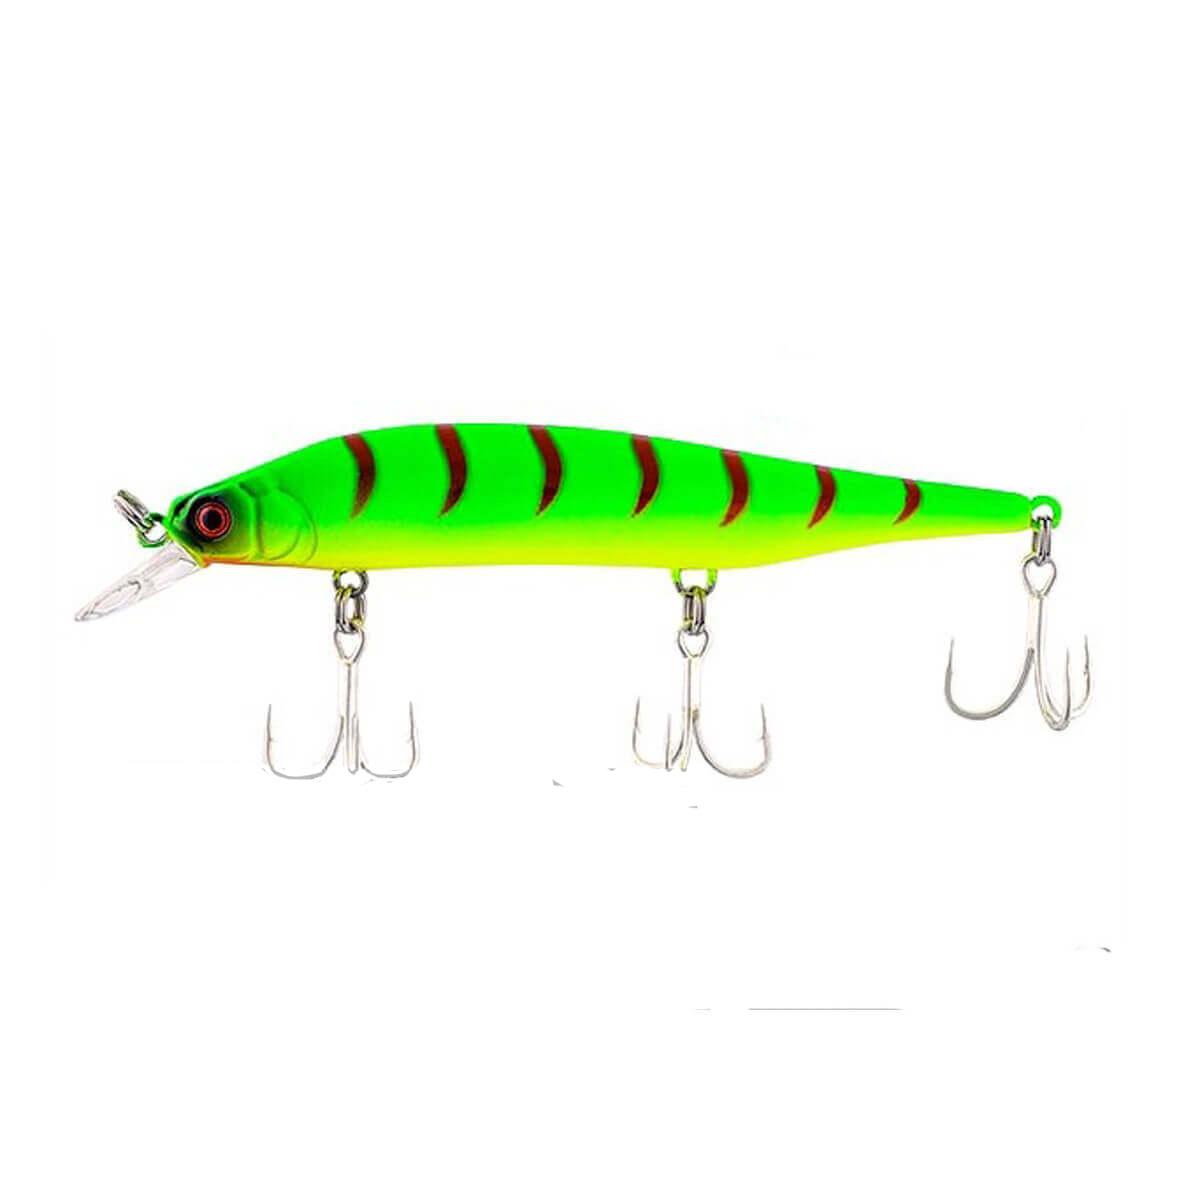 Isca Artificial Nitro Fishing Killer 98  - Pró Pesca Shop